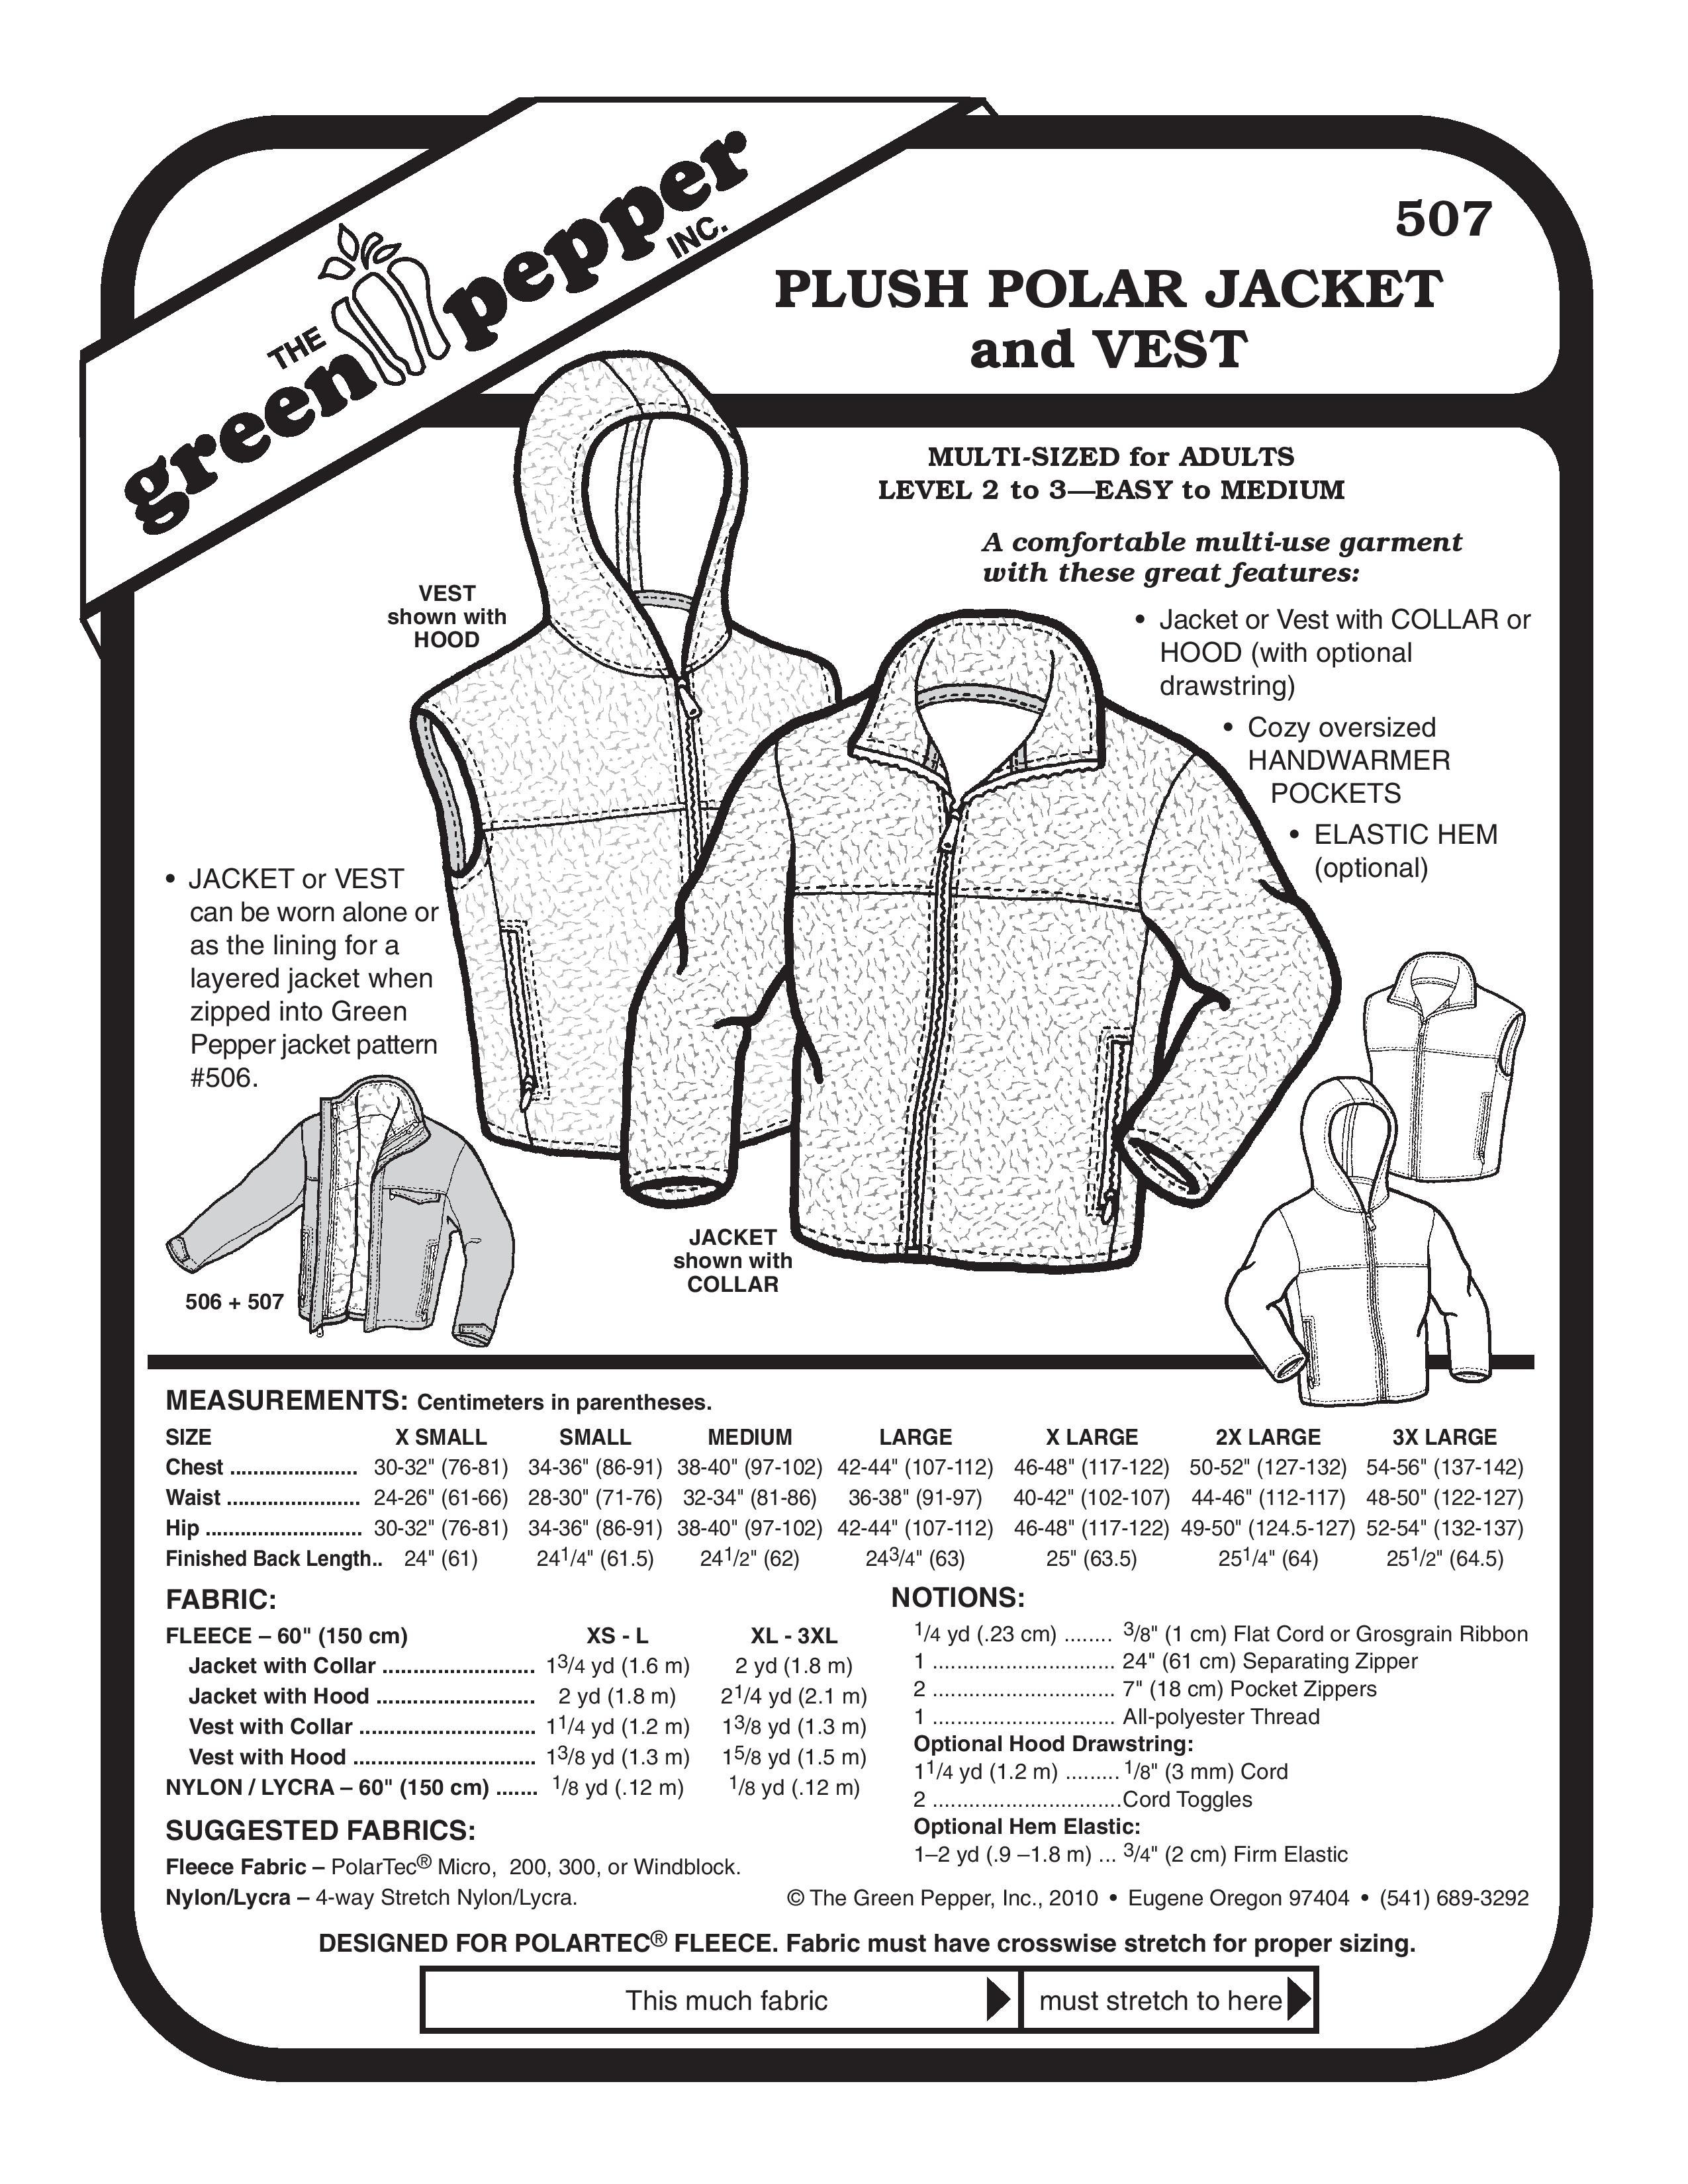 Plush Polar Jacket & Vest Sewing Pattern